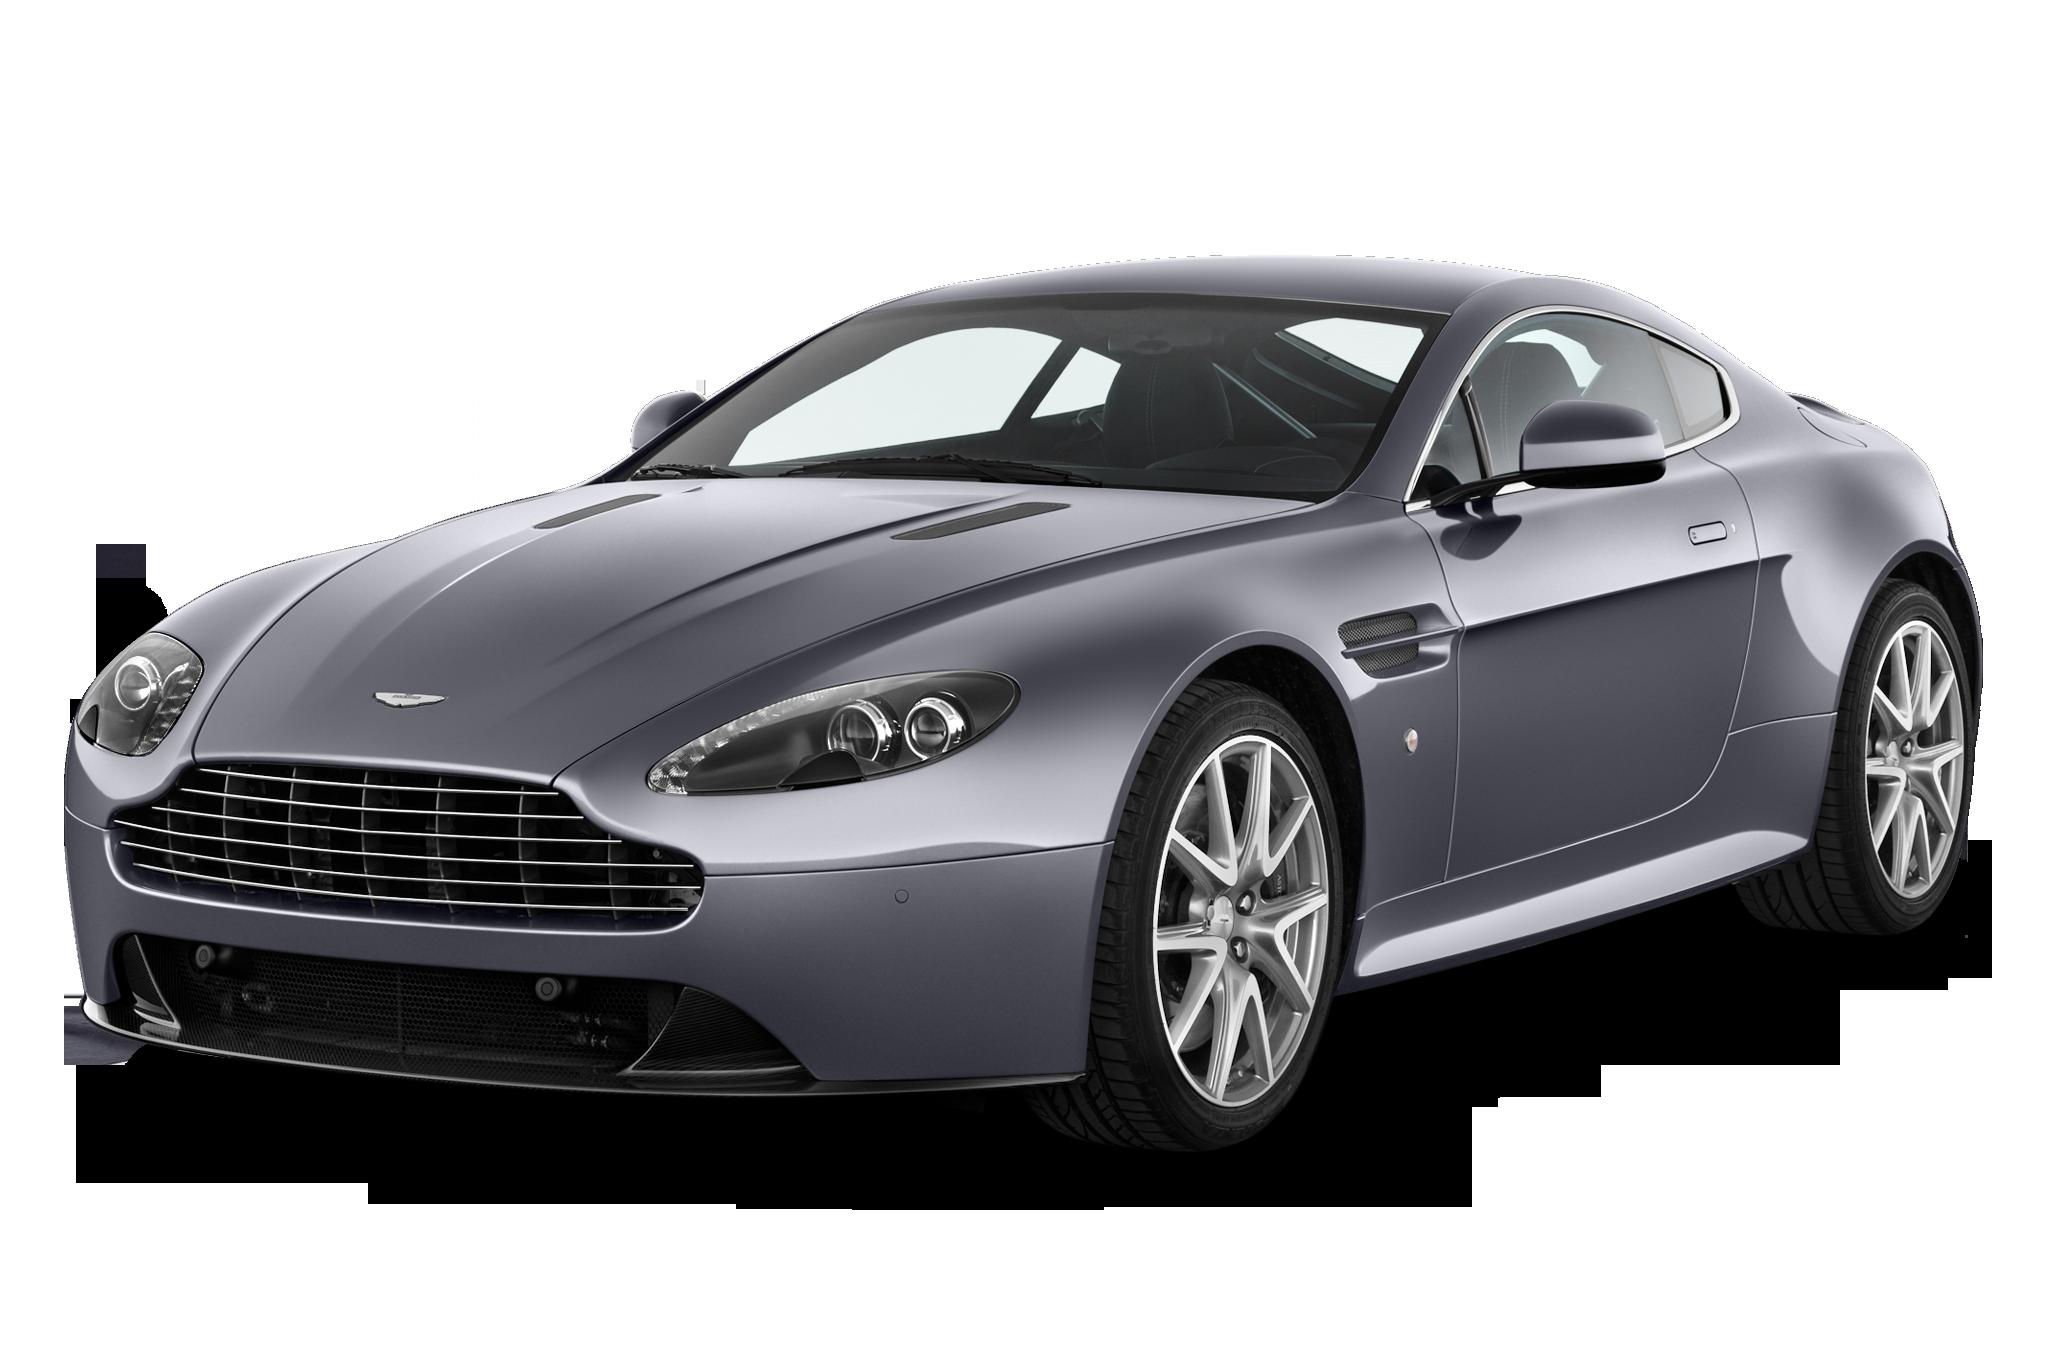 c50c8557bebc 2013 Aston Martin V8 Vantage Reviews and Rating